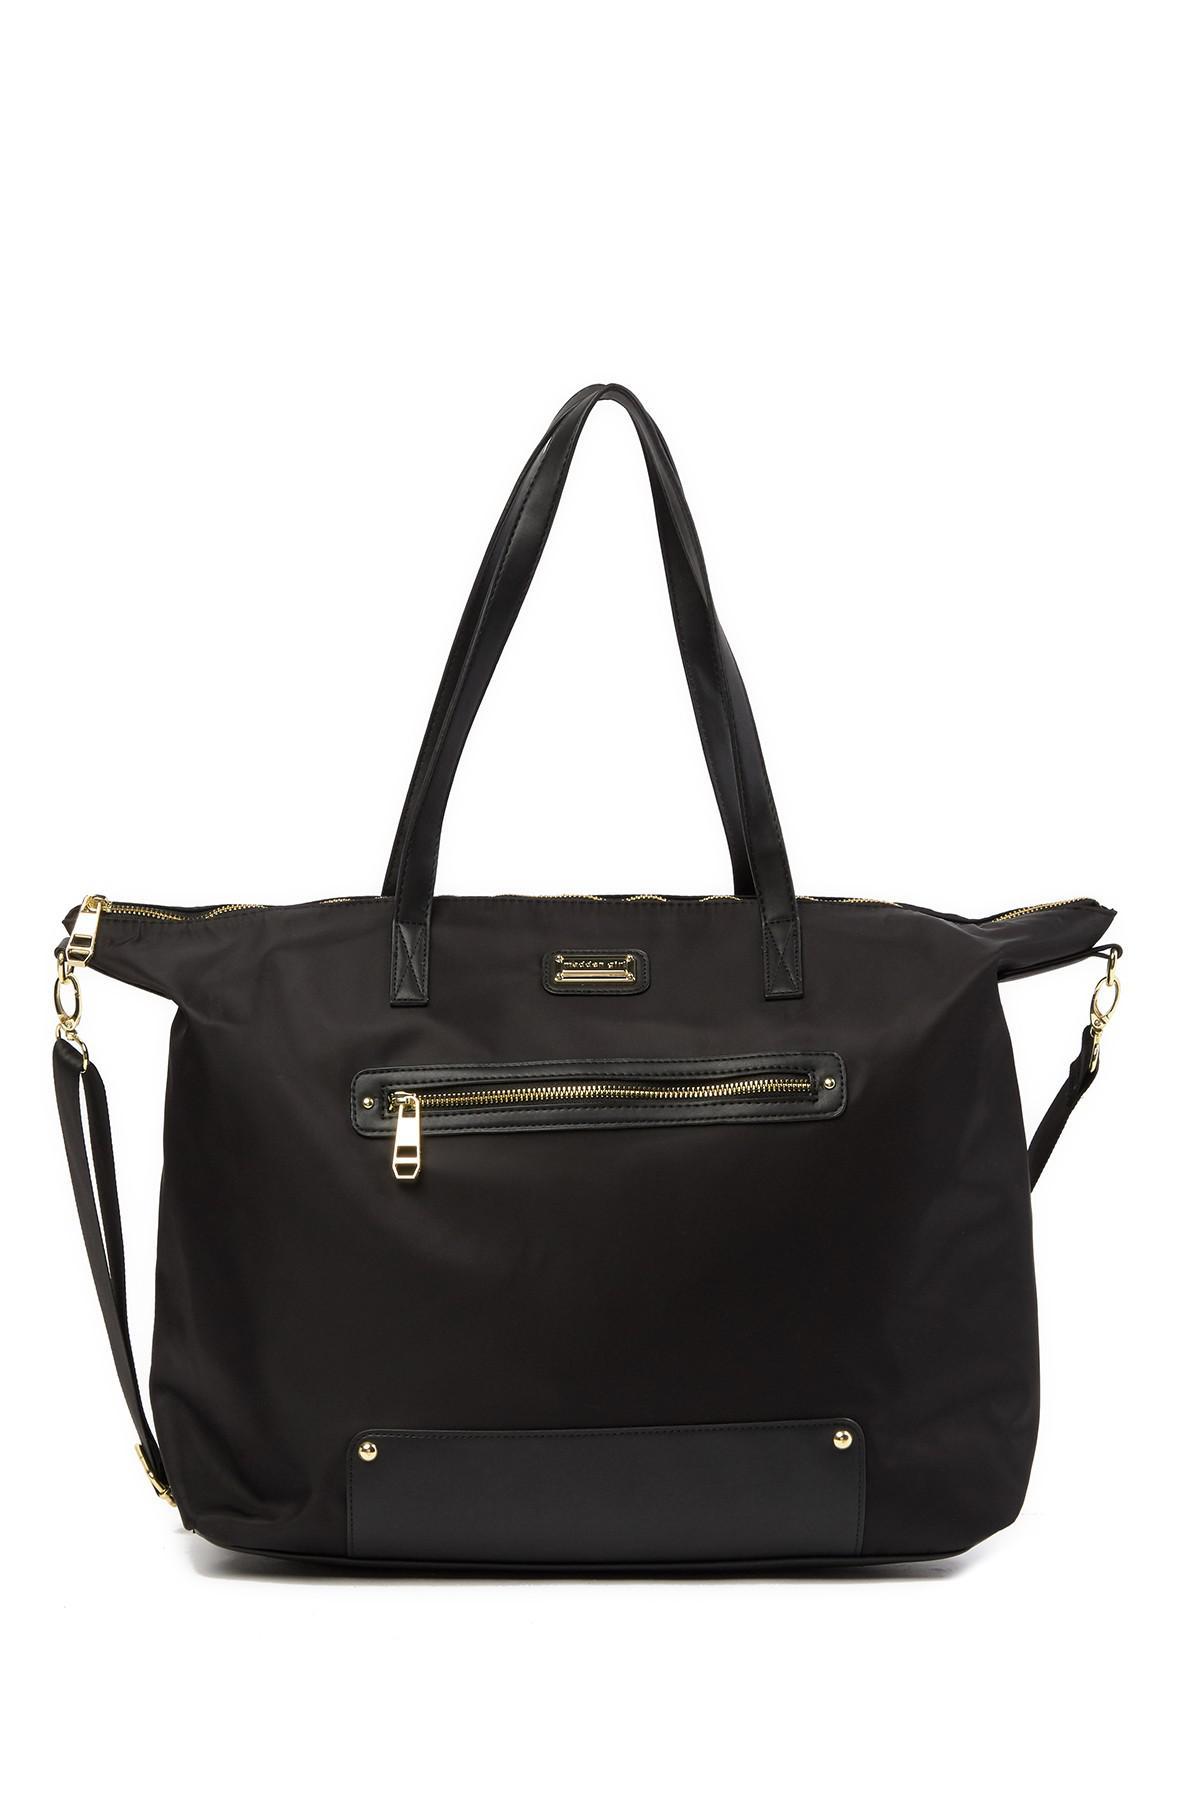 0c8860c9d484 Lyst - Madden Girl Overnighter Tote Bag in Black